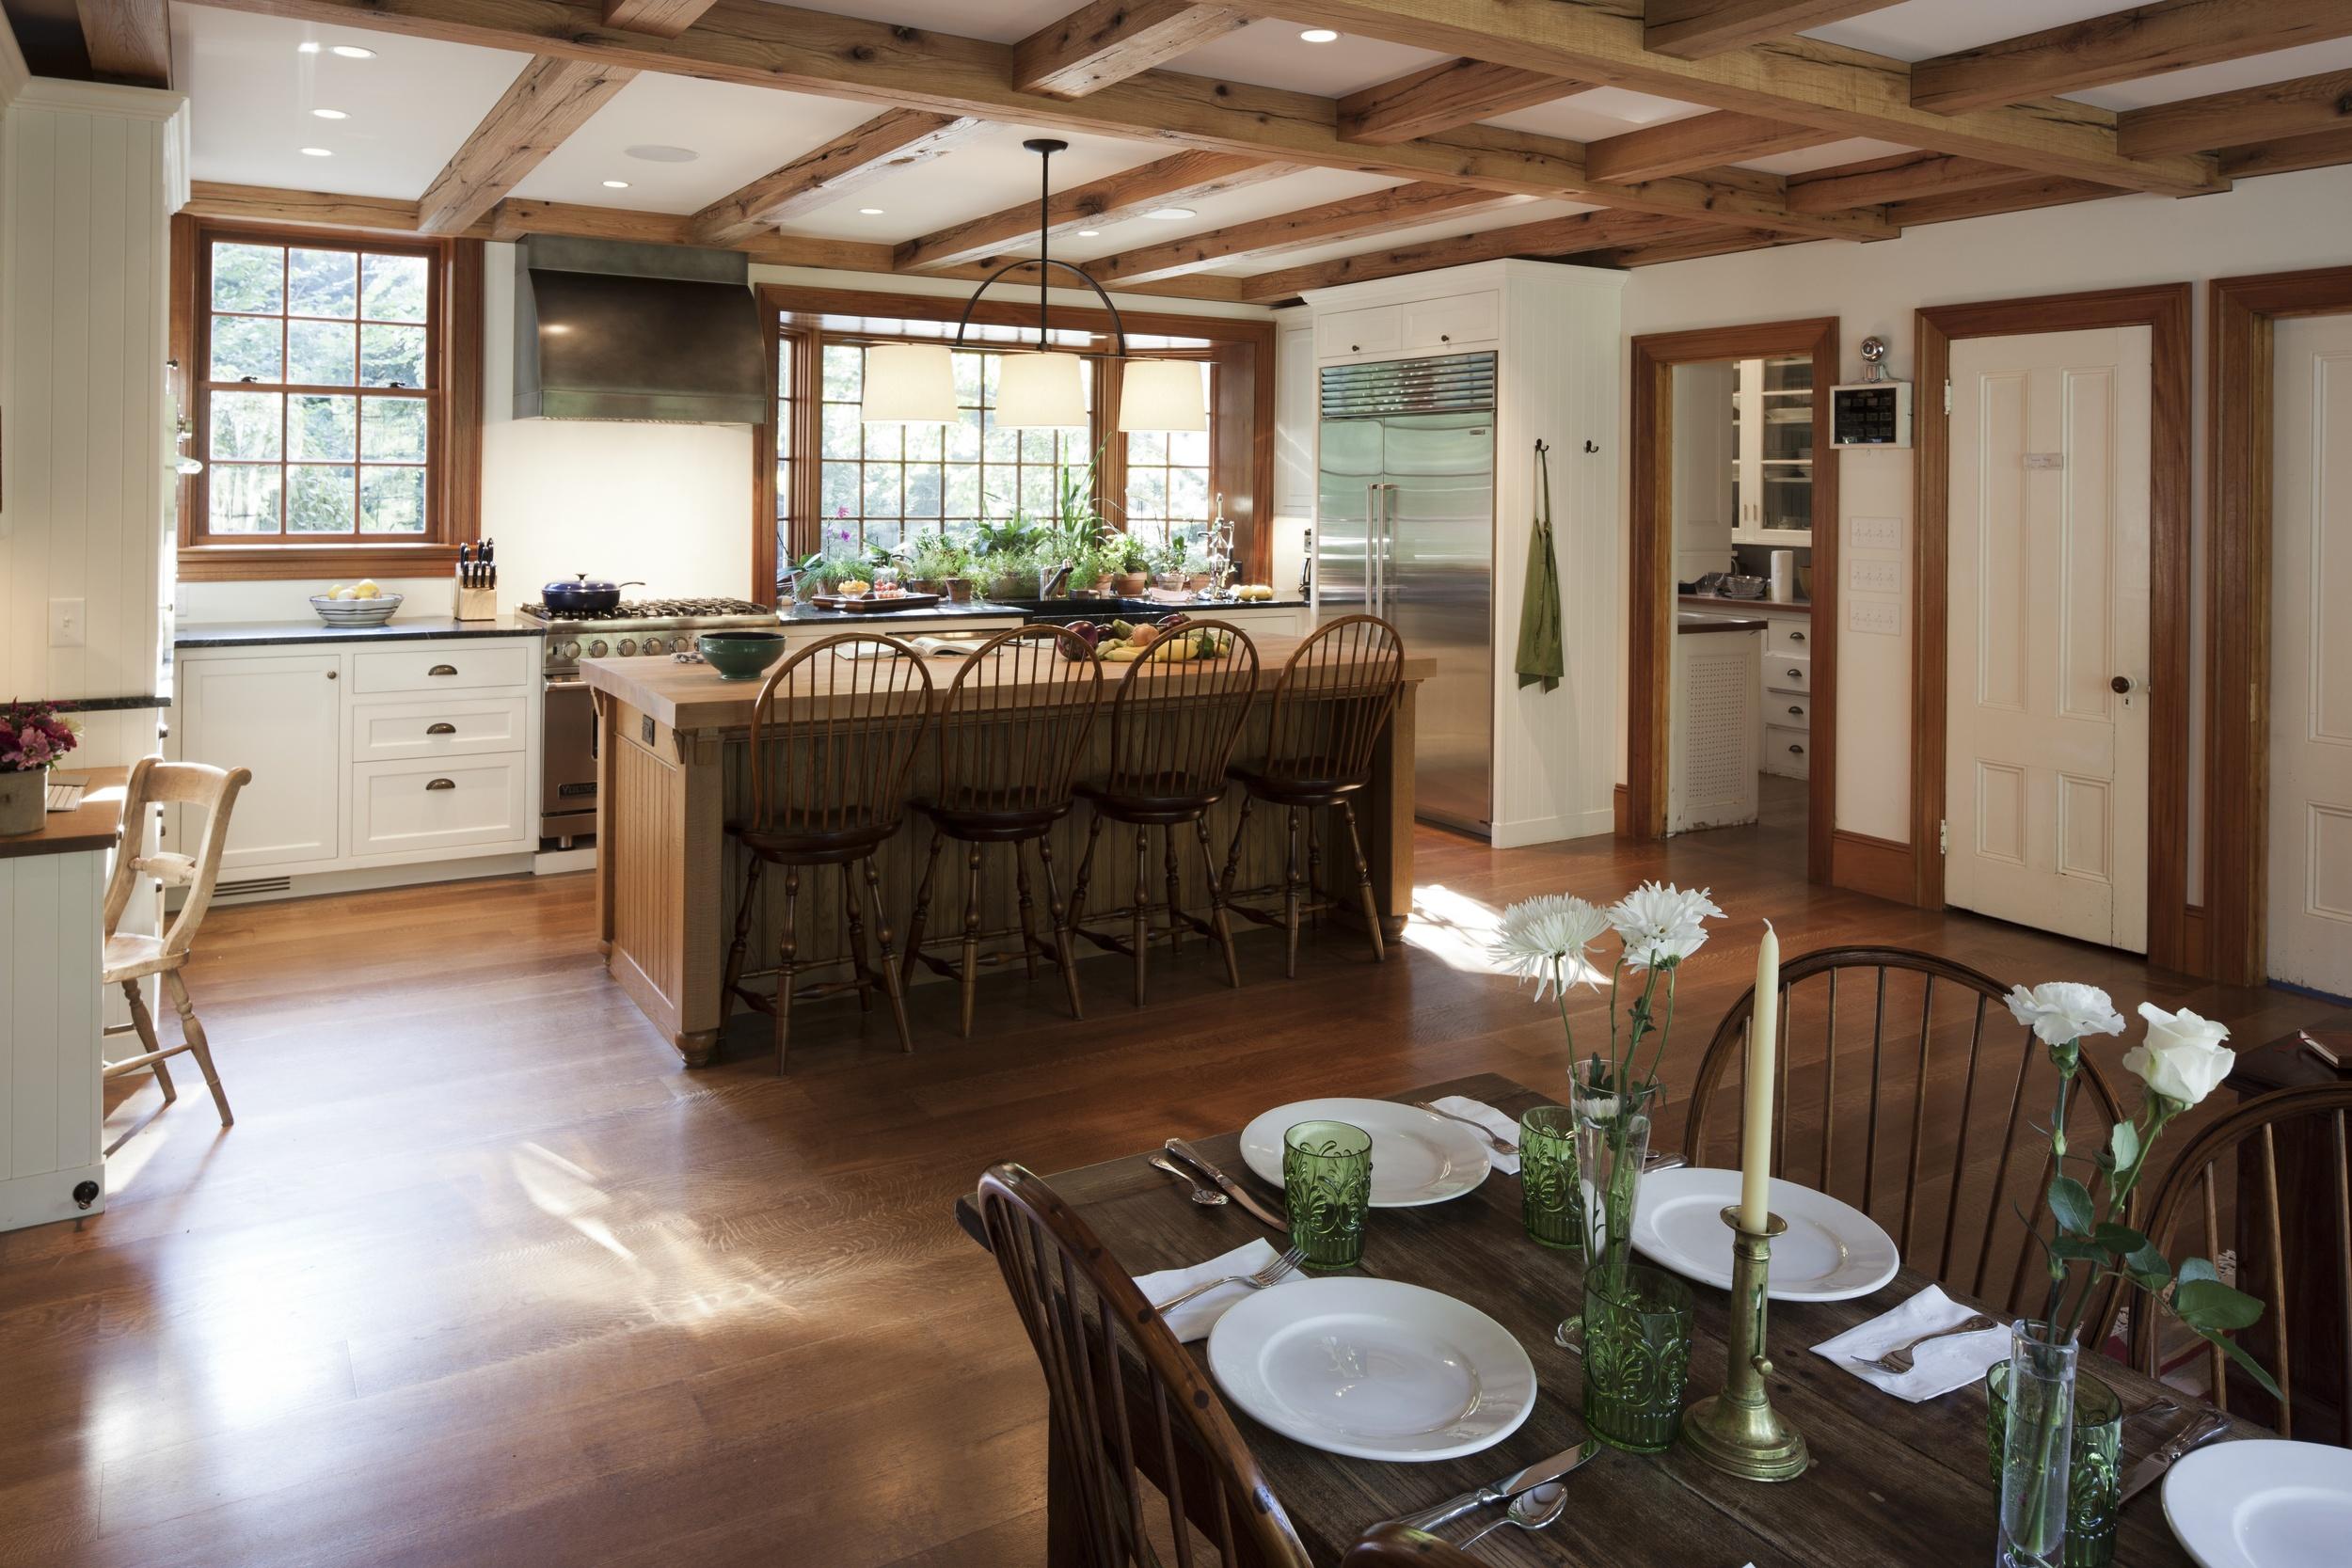 2 Wilm Dedham kitchen towards pantry.jpg